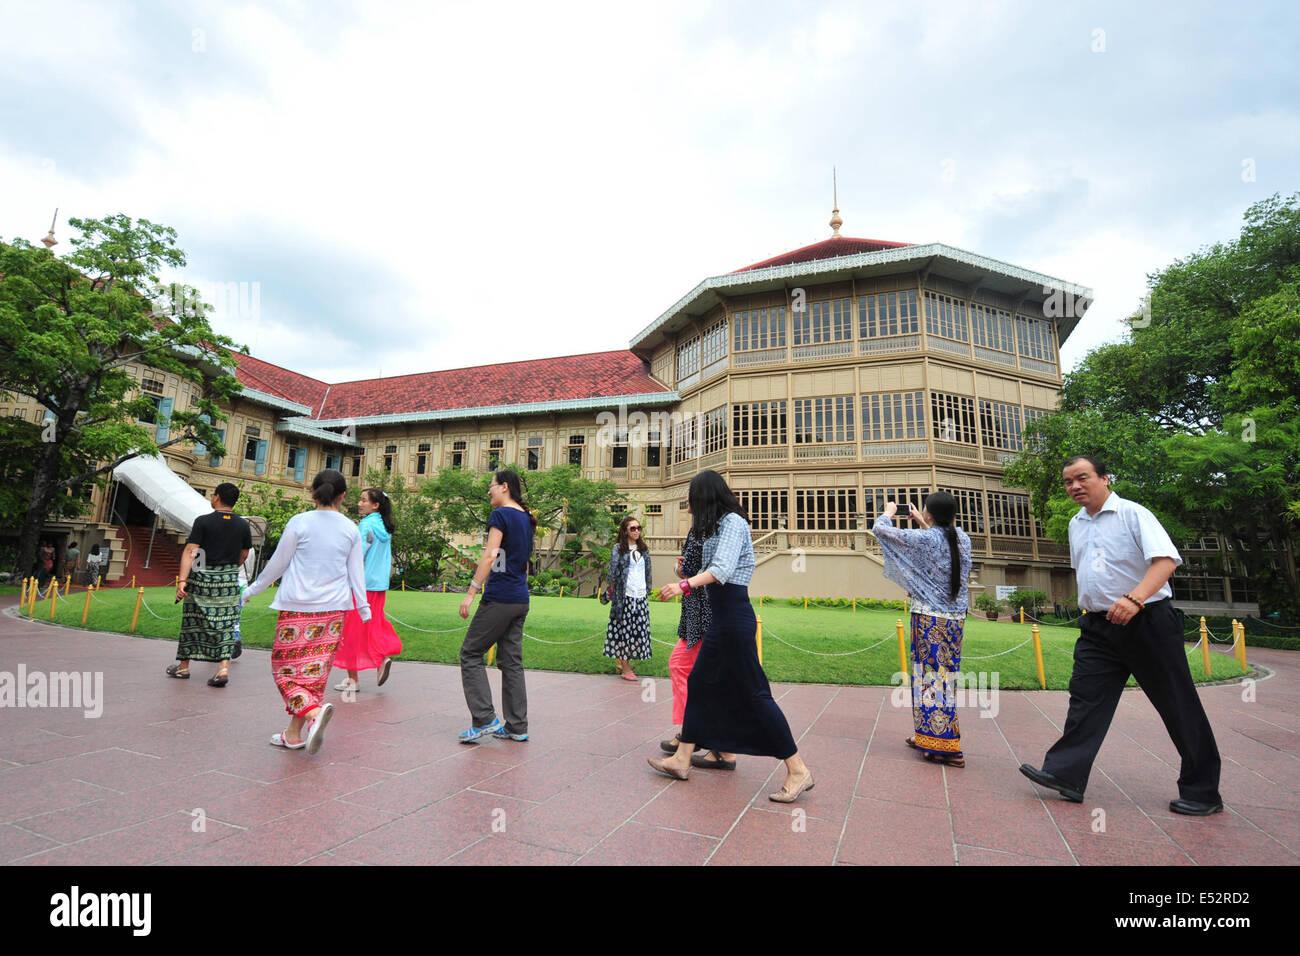 Bangkok, Thailand. 18th July, 2014. Chinese tourists visit the Vimanmek mansion in Bangkok, Thailand, July 18, 2014. - Stock Image